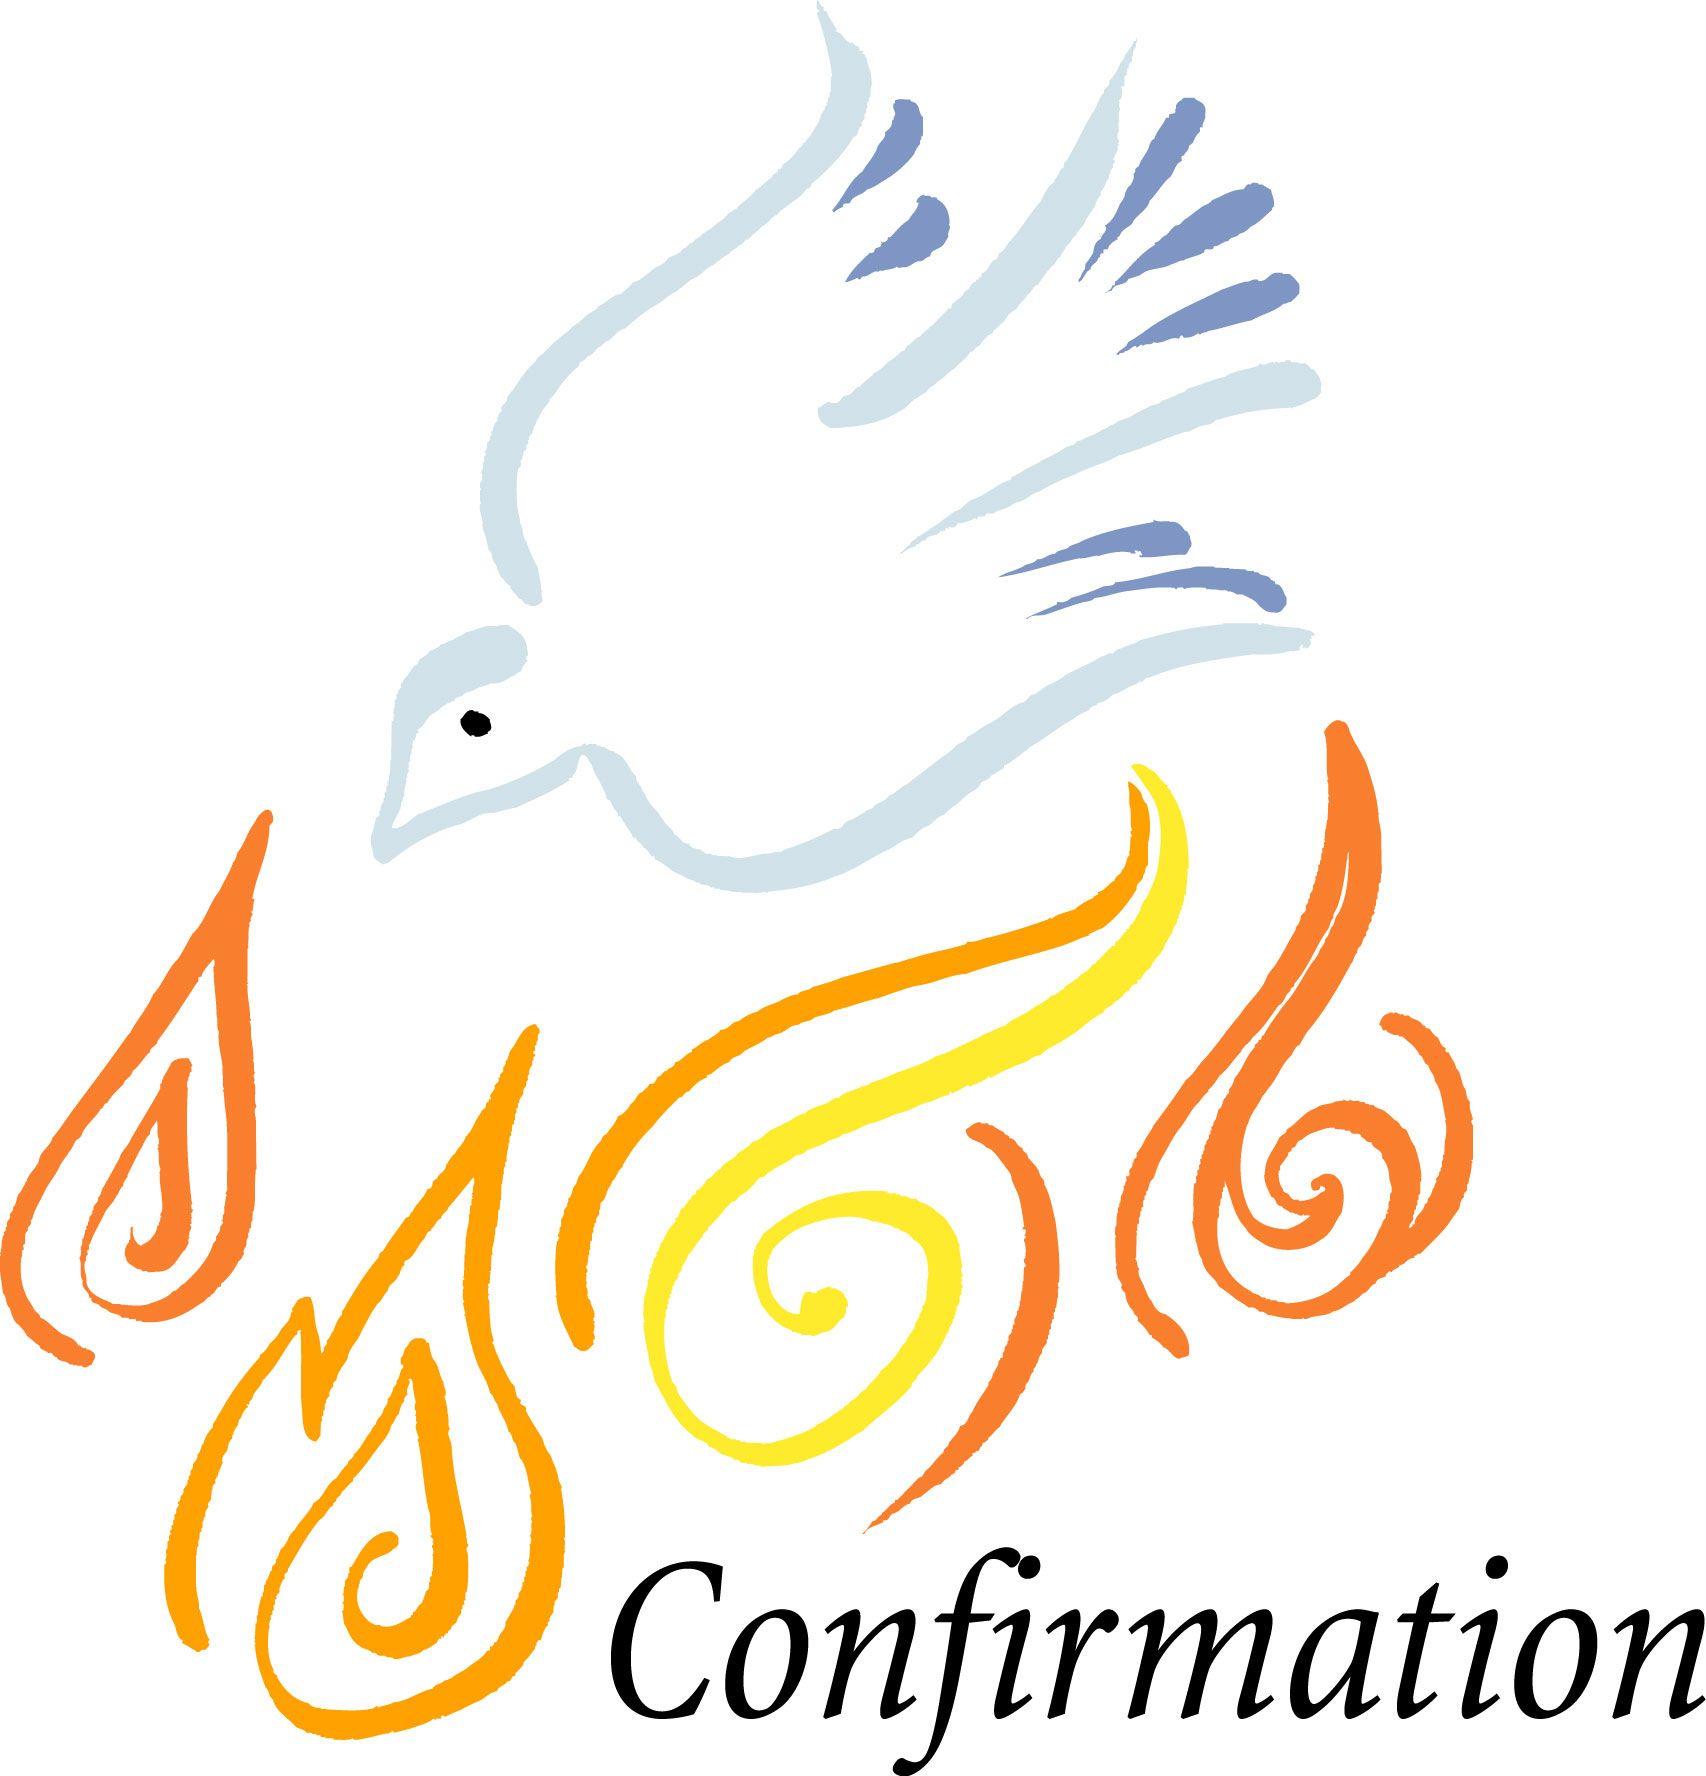 Catholic clipart confirmation. Symbols free clip art